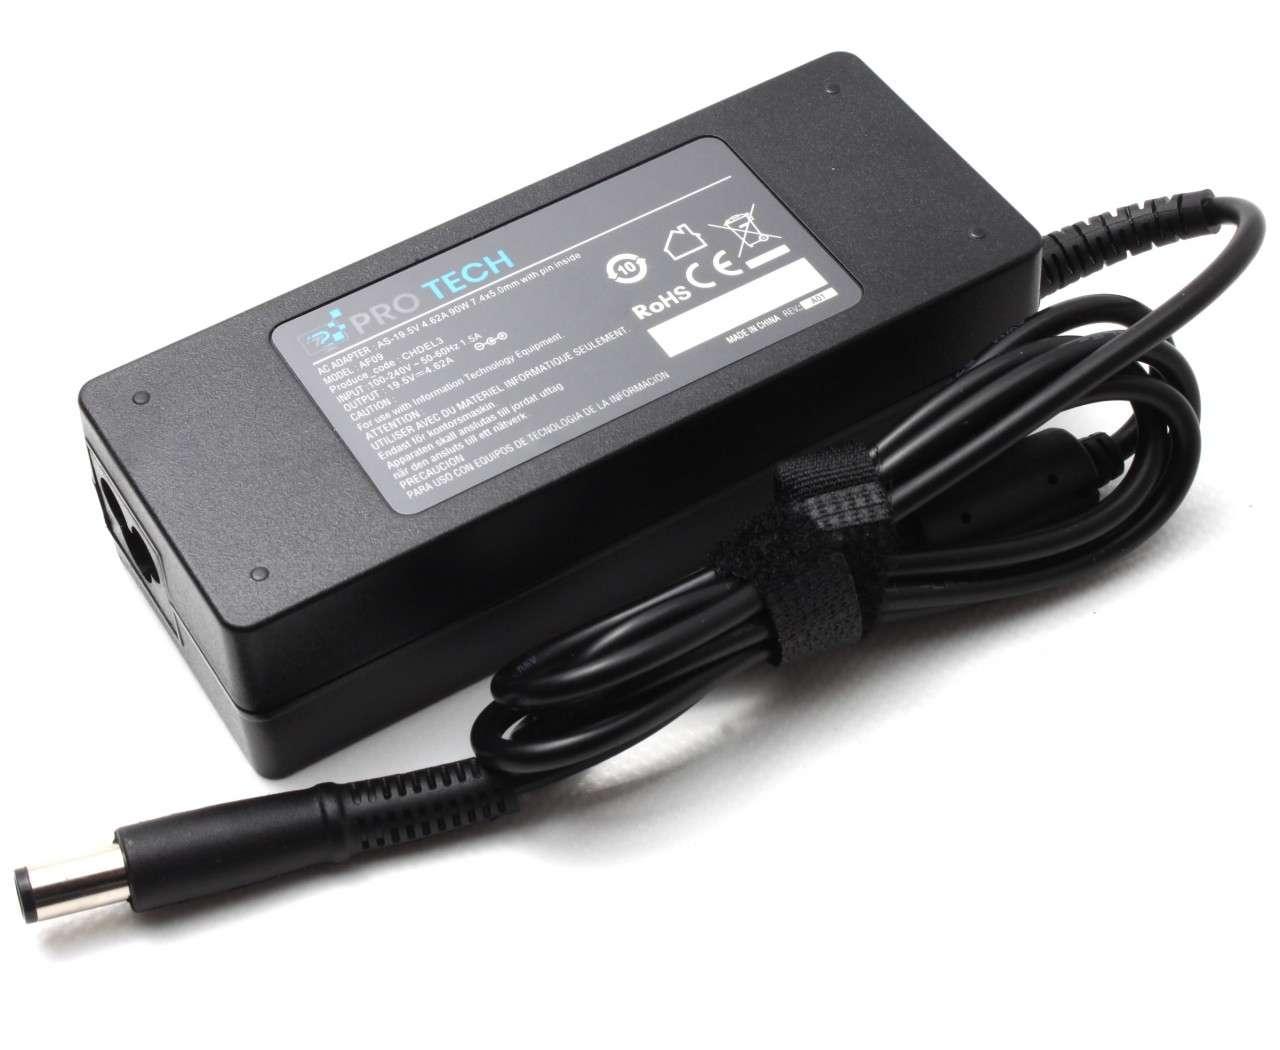 Incarcator Dell Vostro A840 Replacement imagine powerlaptop.ro 2021